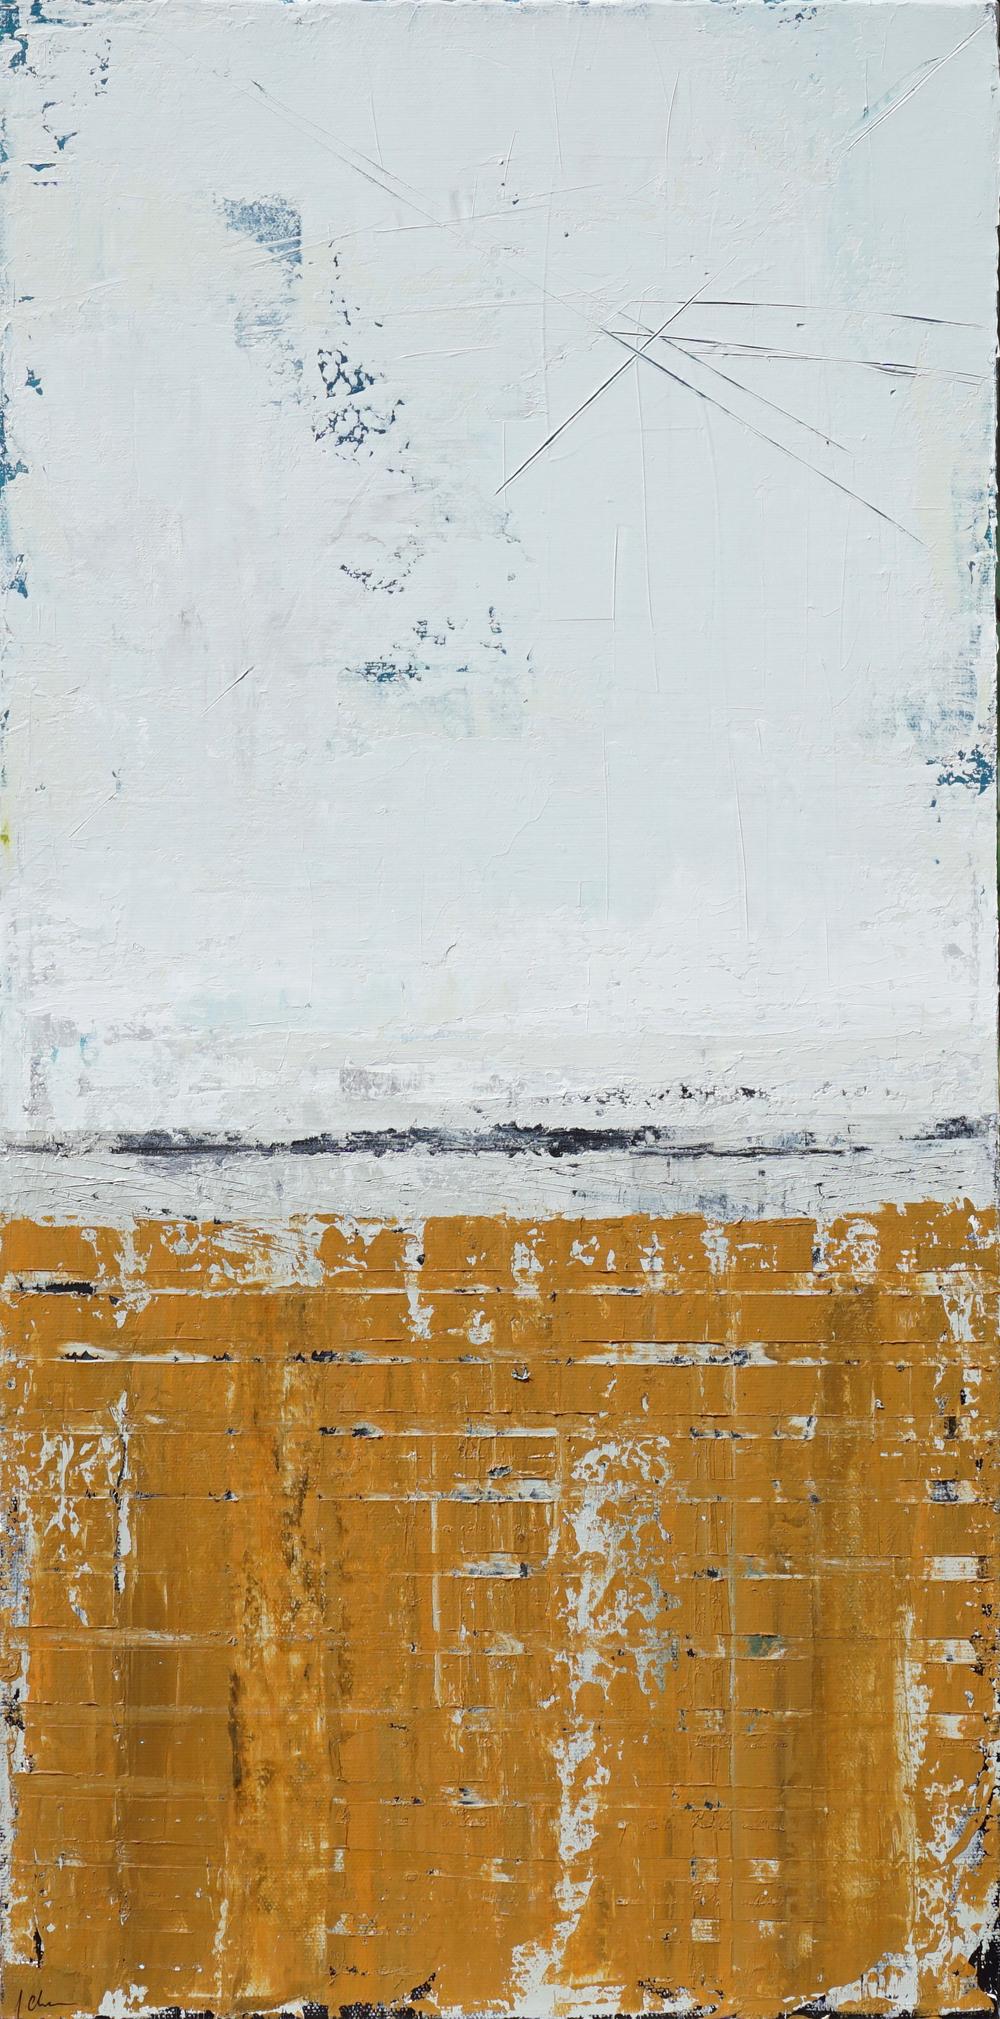 Wall Study #2724 x 12